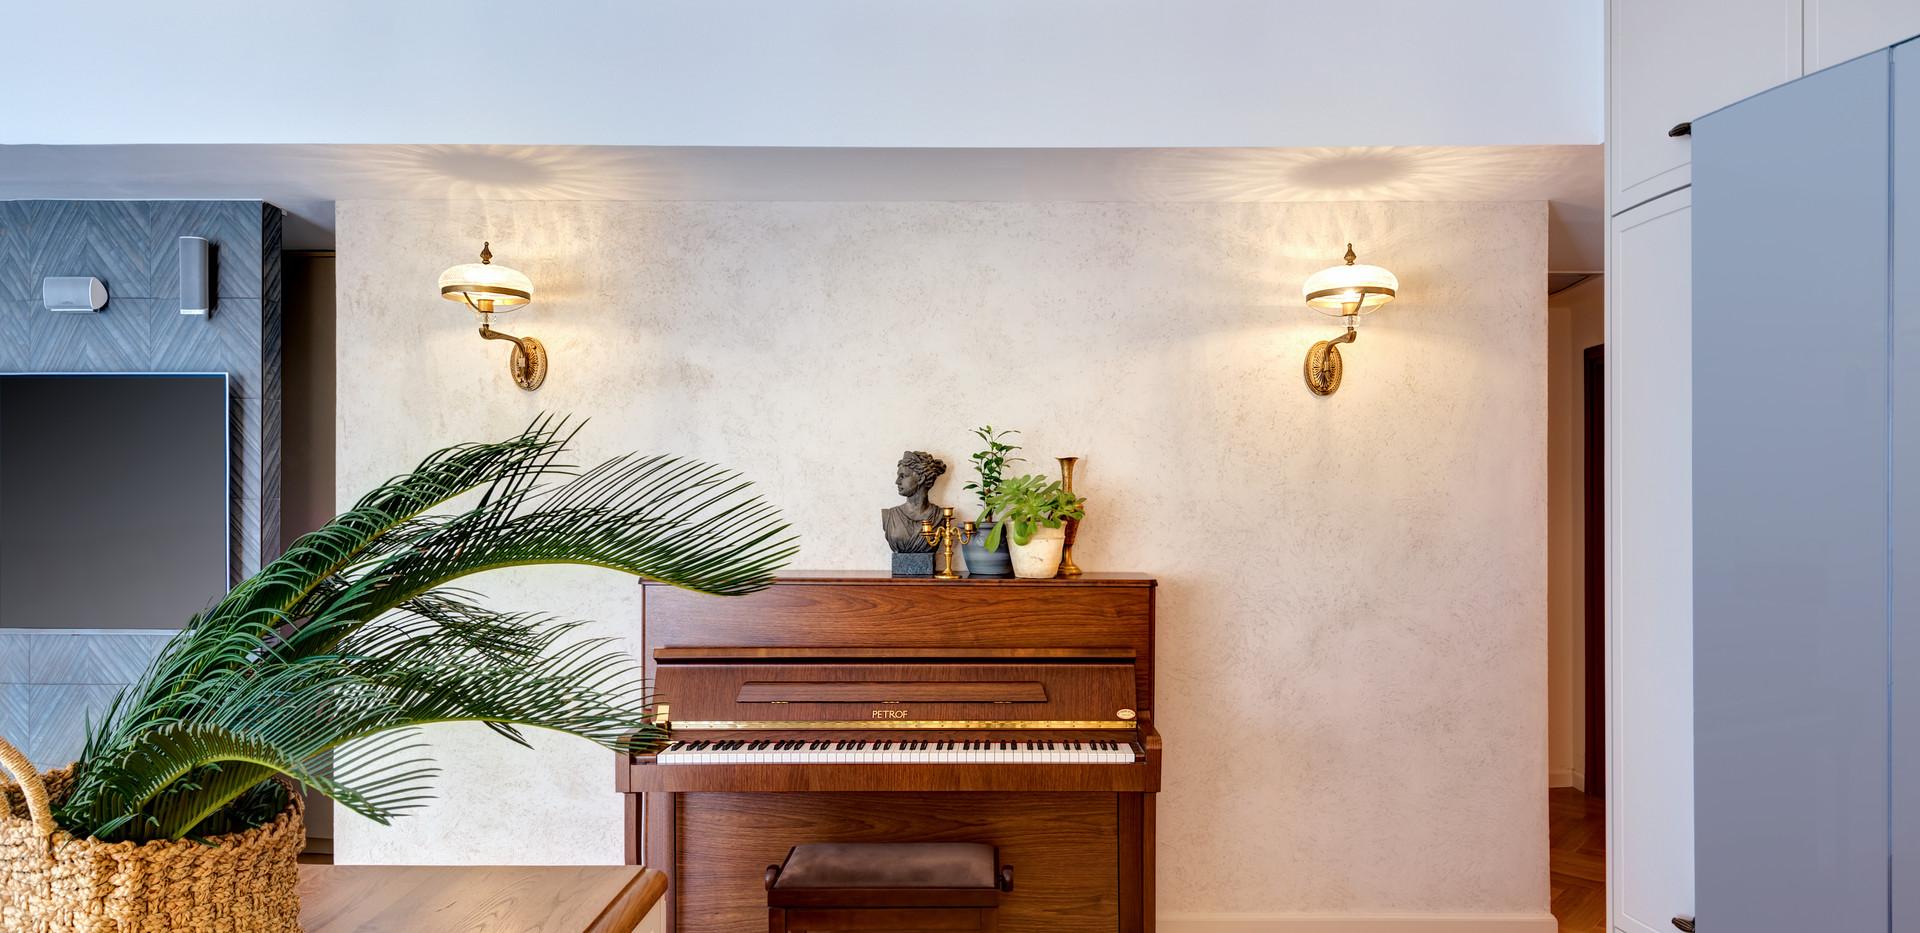 Apartment - Kfar Saba